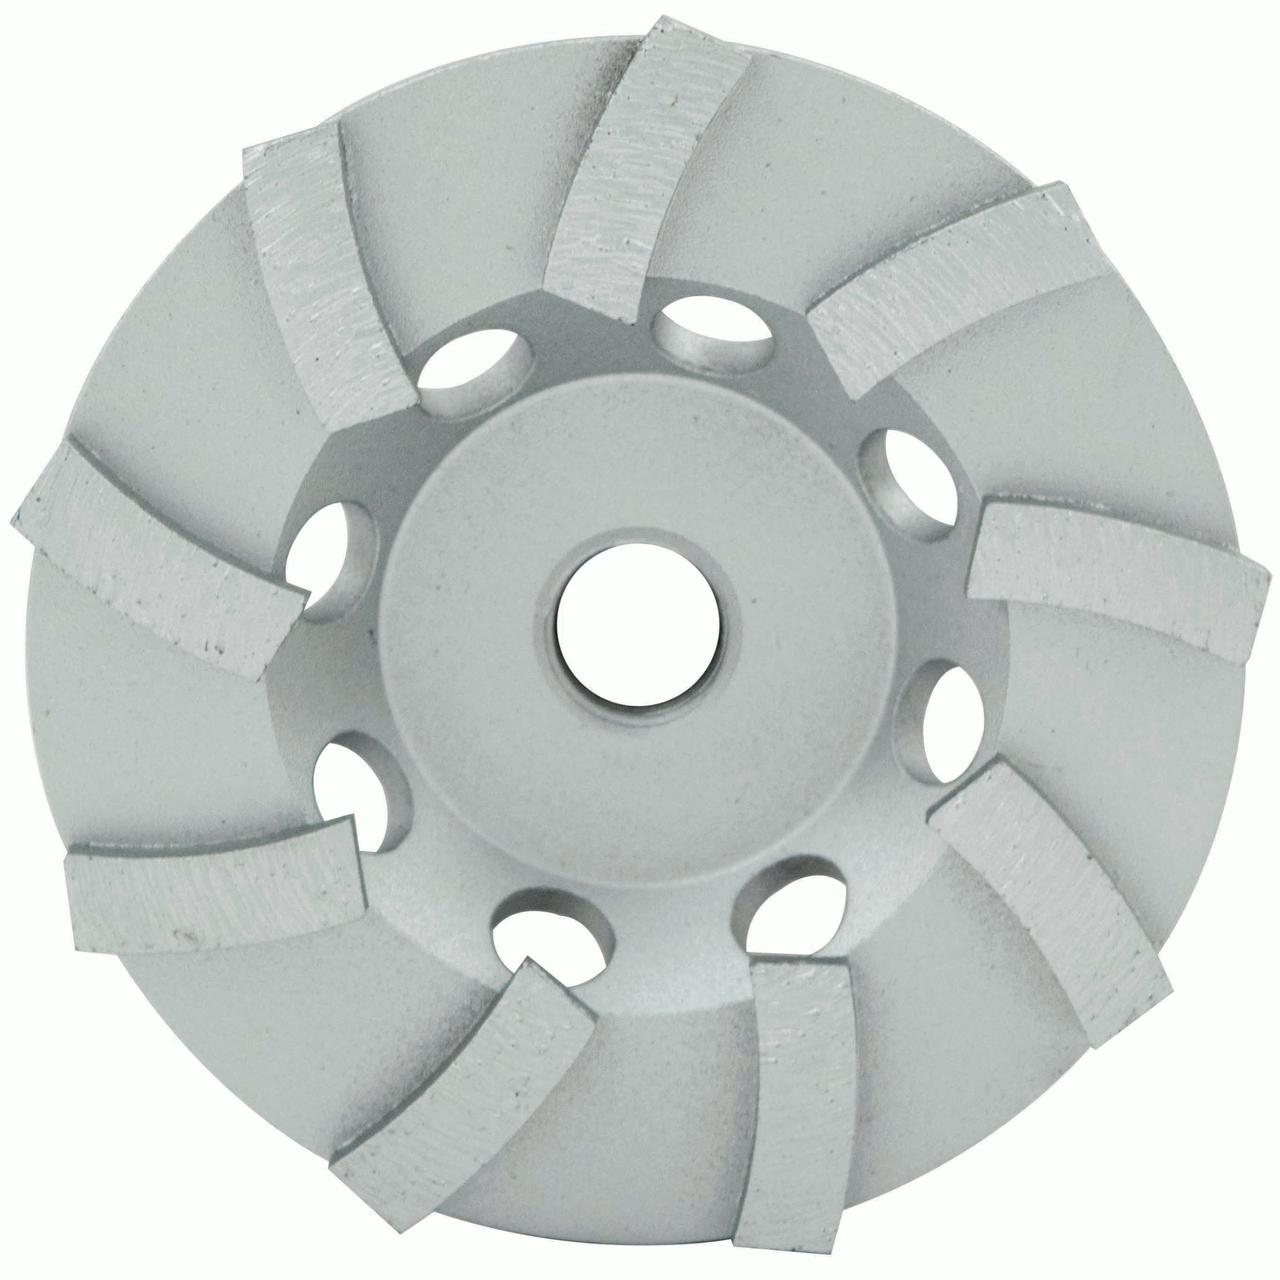 "4"" Spp Series Segmented Turbo Cup Wheel, Wet/Dry, 7/8""-5/8"", 9 Segments"